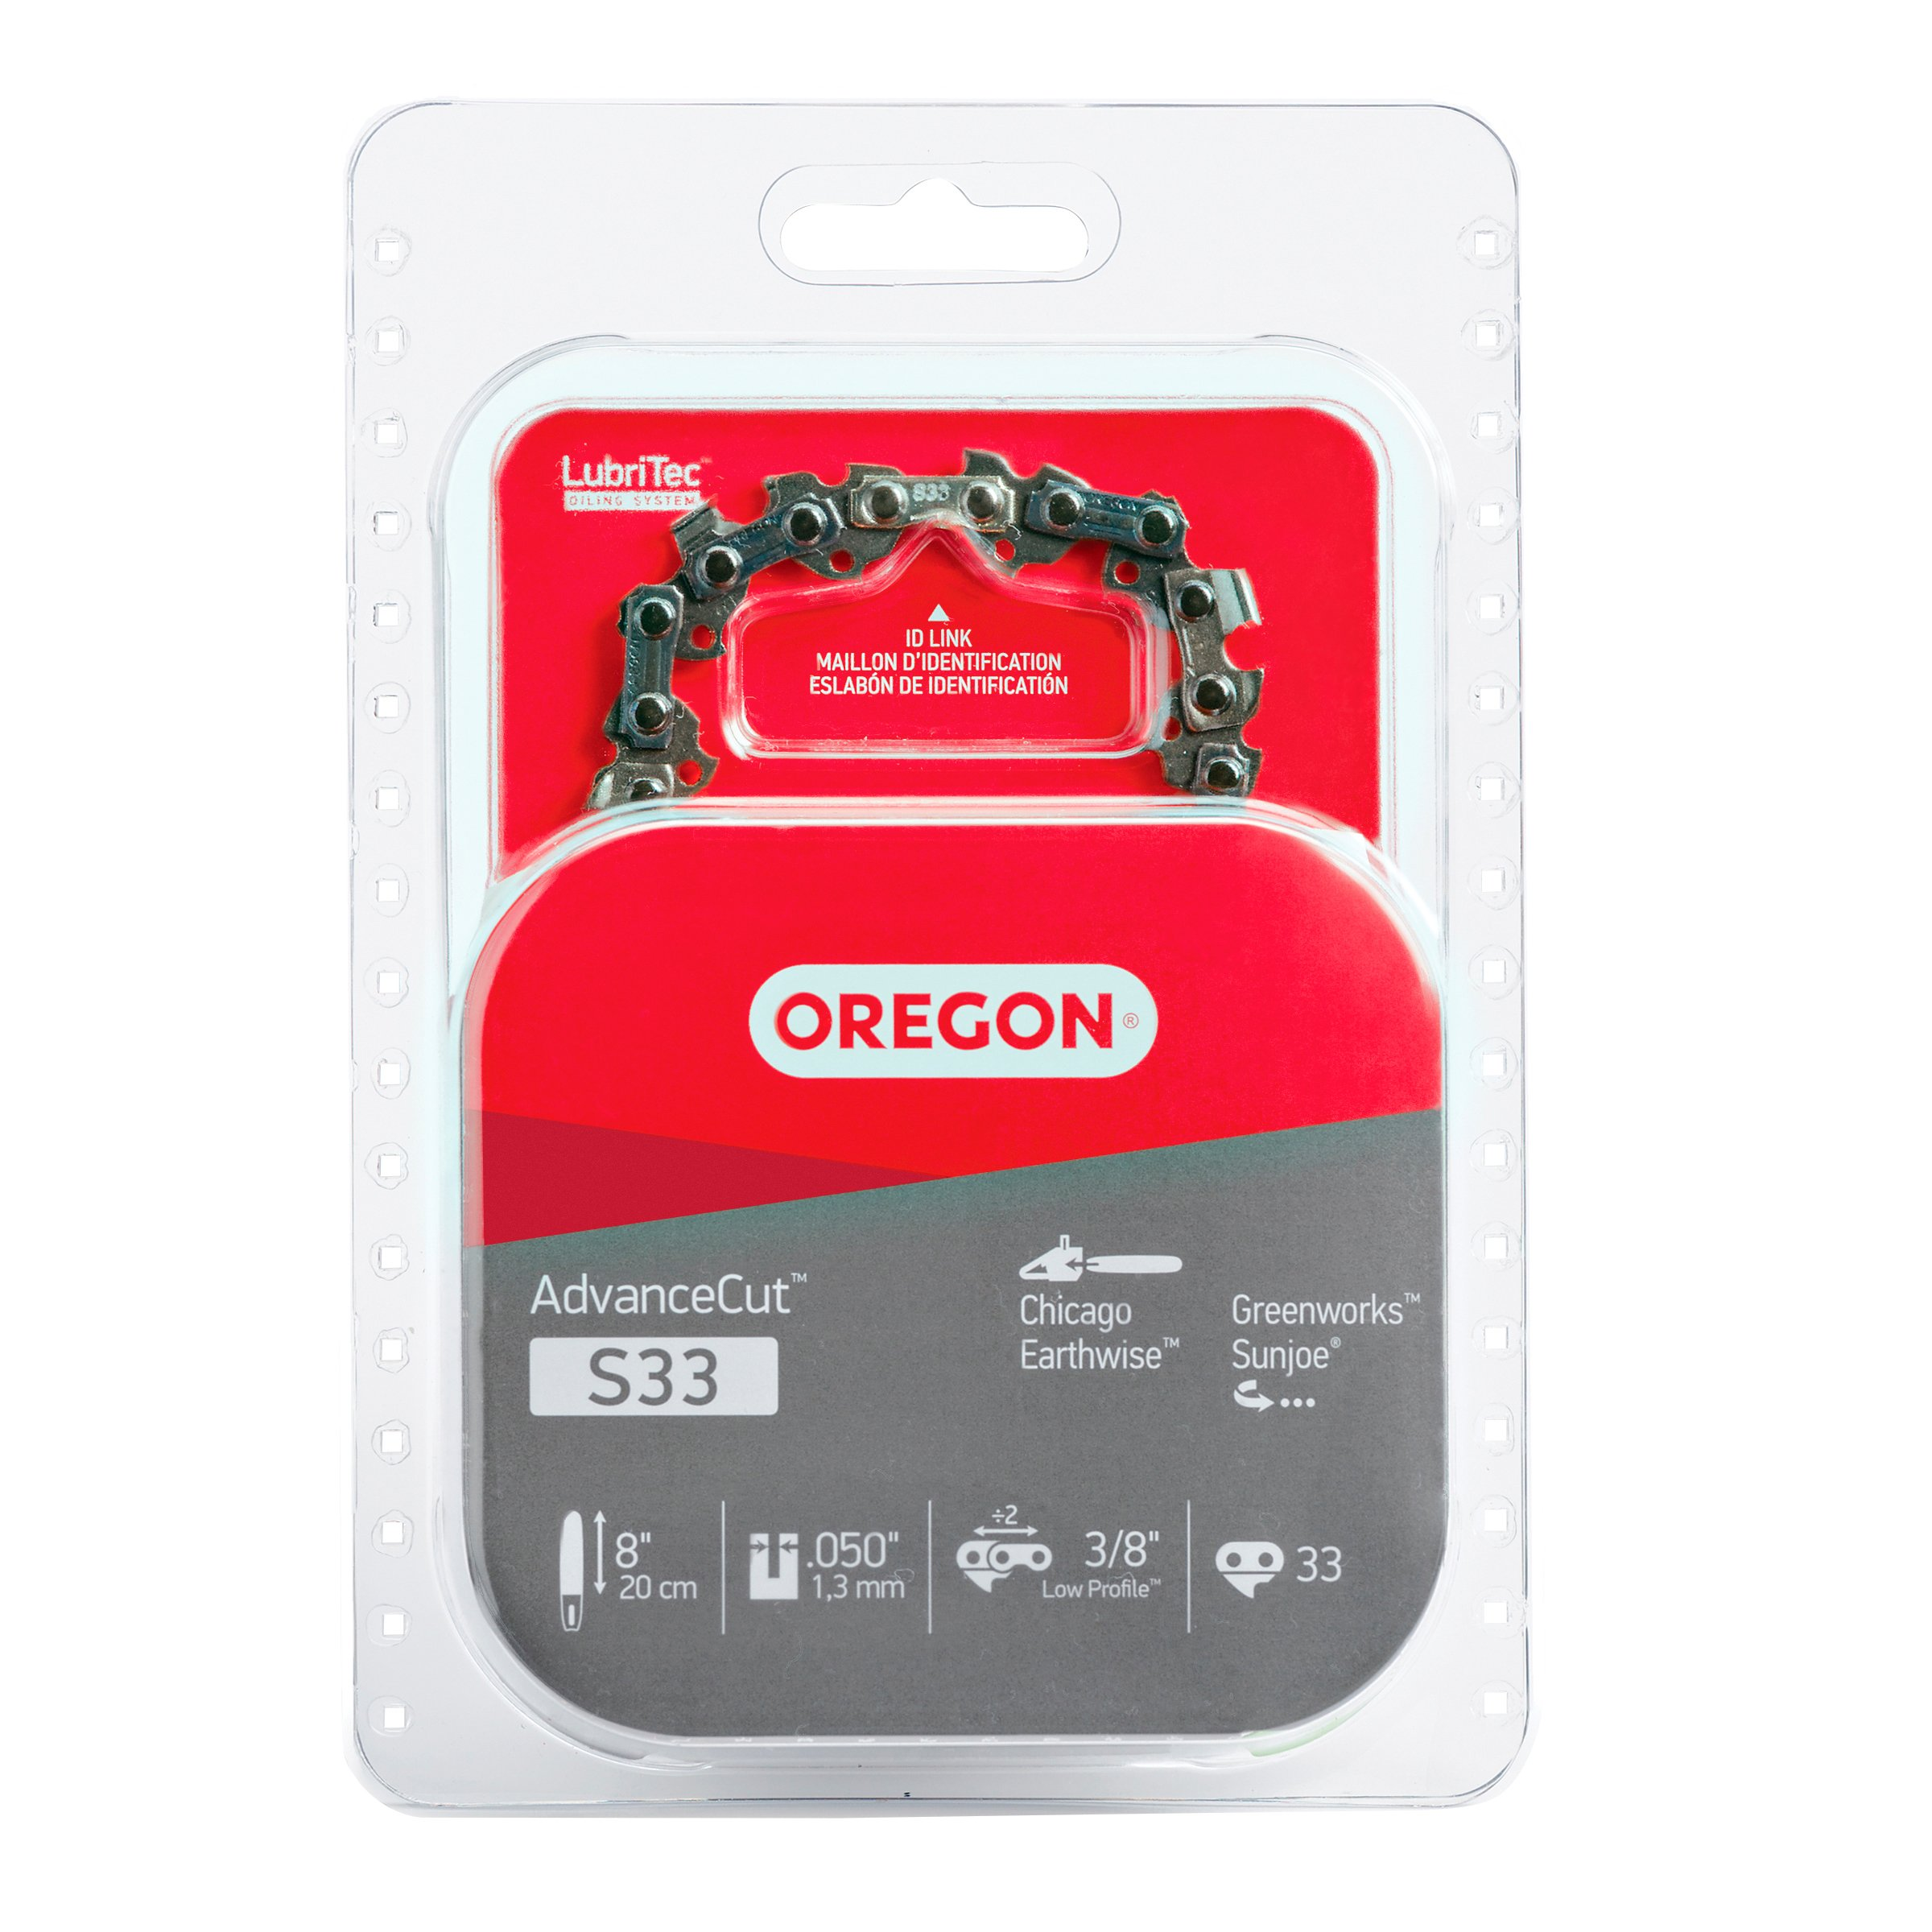 Oregon S33 AdvanceCut 8-Inch Chainsaw Chain, Fits Chicago, Earthwise, Greenworks, Sun Joe by Oregon